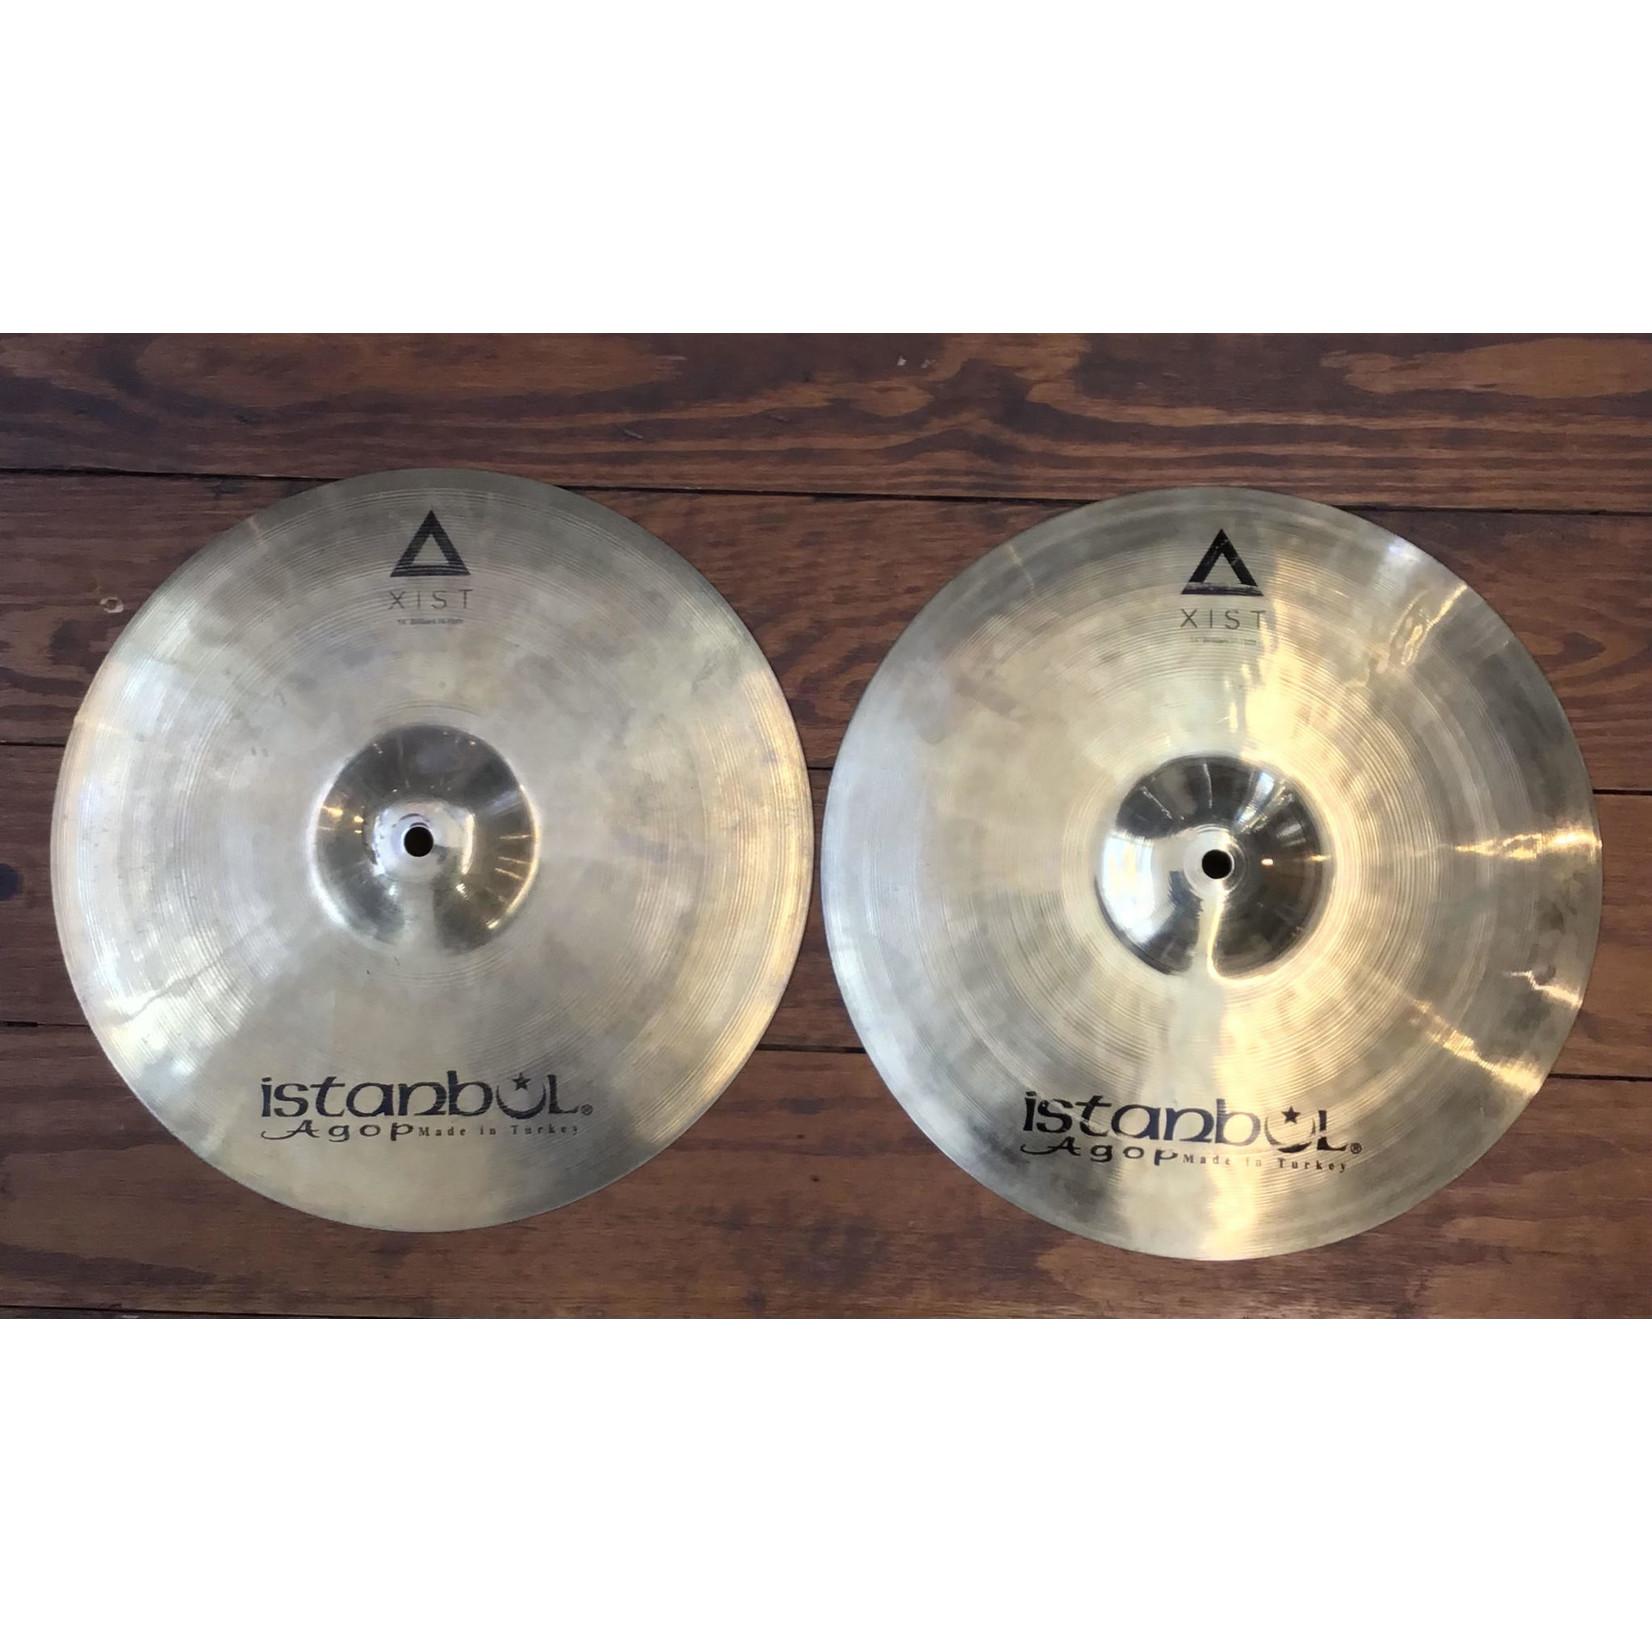 "Istanbul Agop USED Istanbul Agop XIST 14"" Brilliant Hi-Hat Cymbals (Pair)"